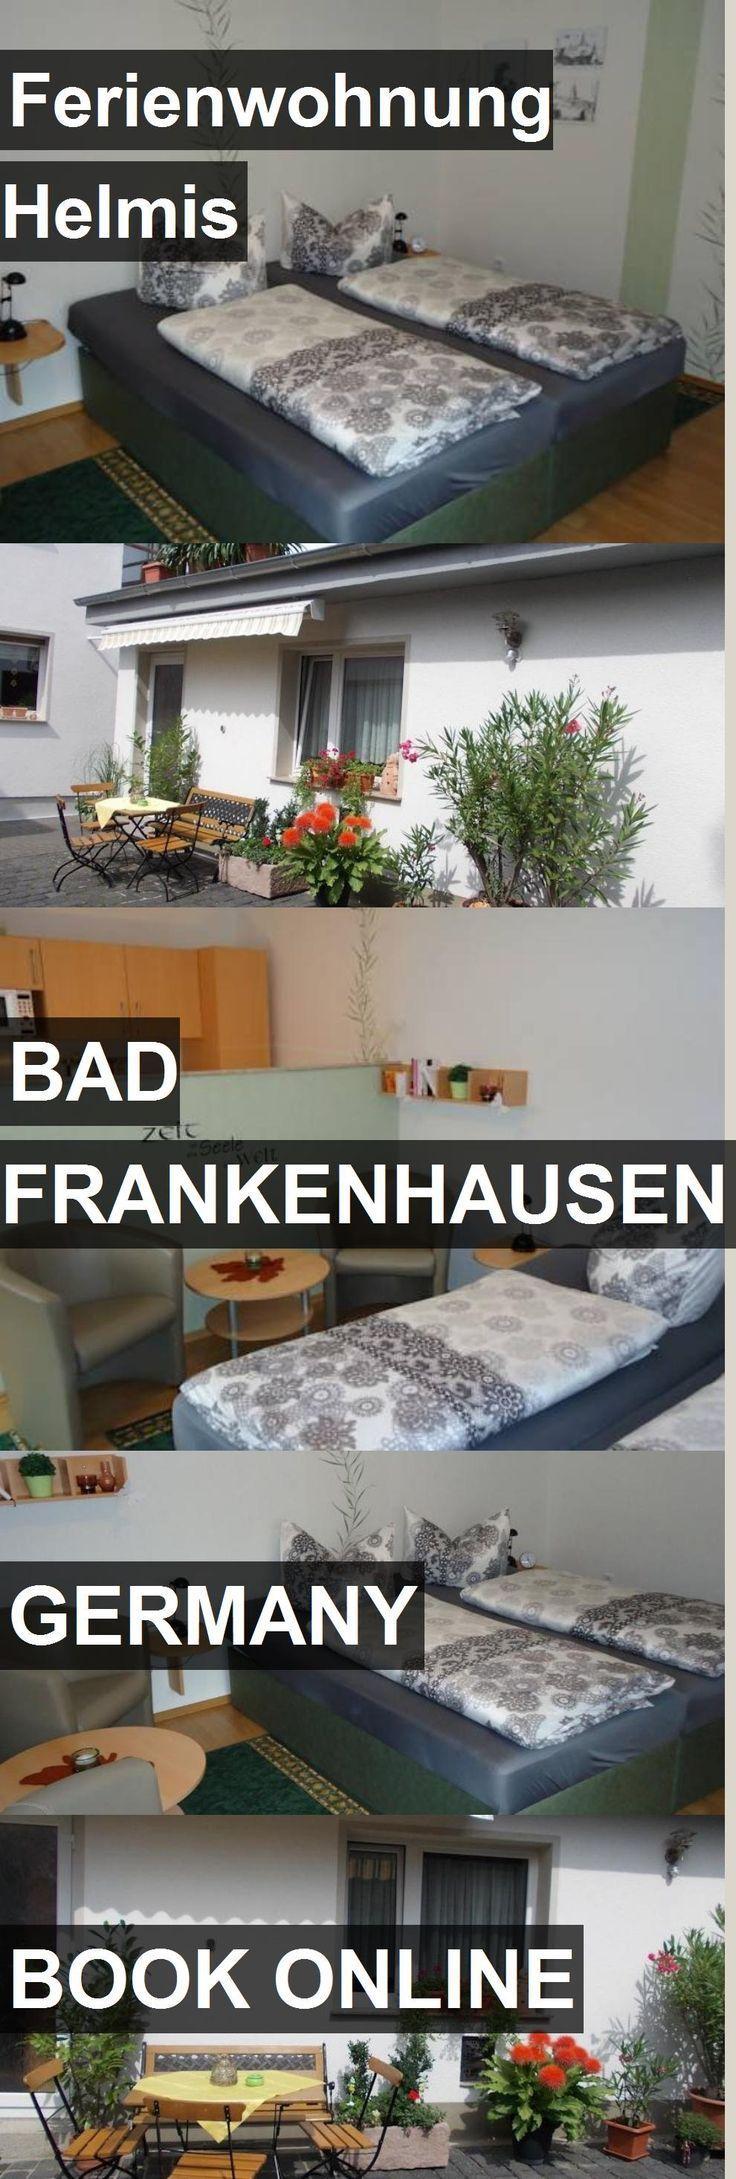 Hotel Ferienwohnung Helmis in Bad Frankenhausen Germany. For more ...